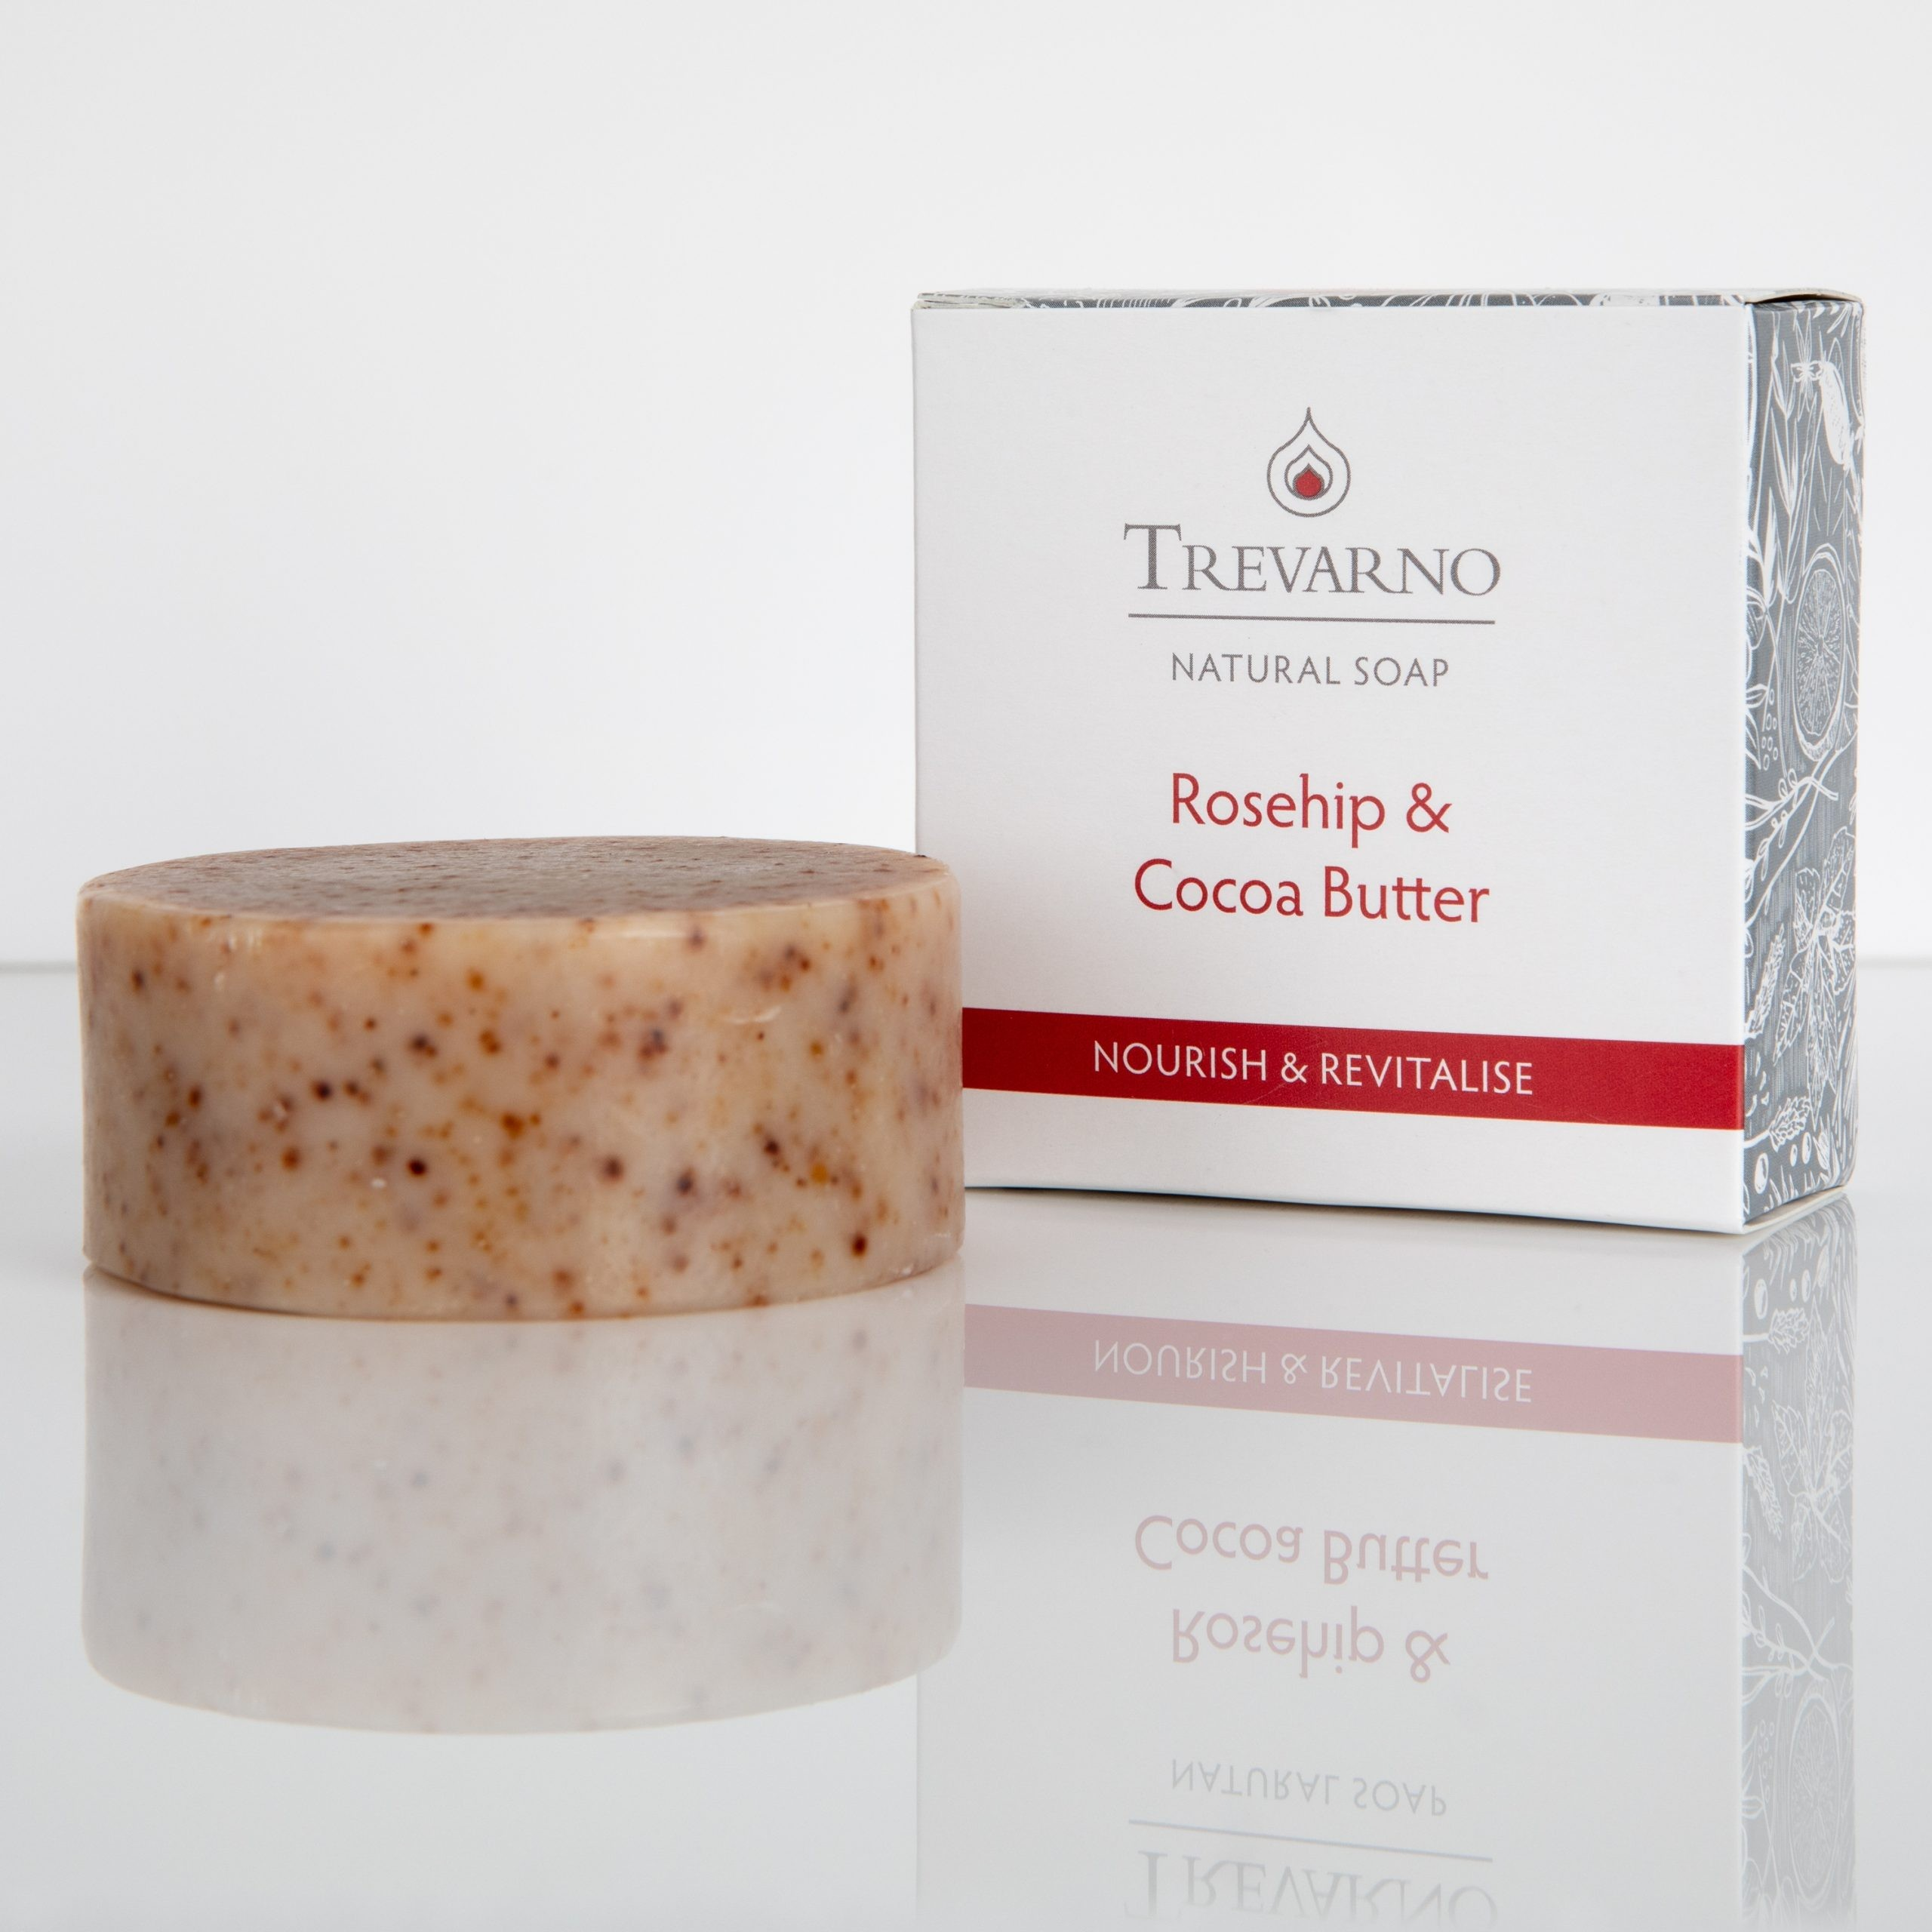 Trevarno Rosehip & Cocoa Butter Soap